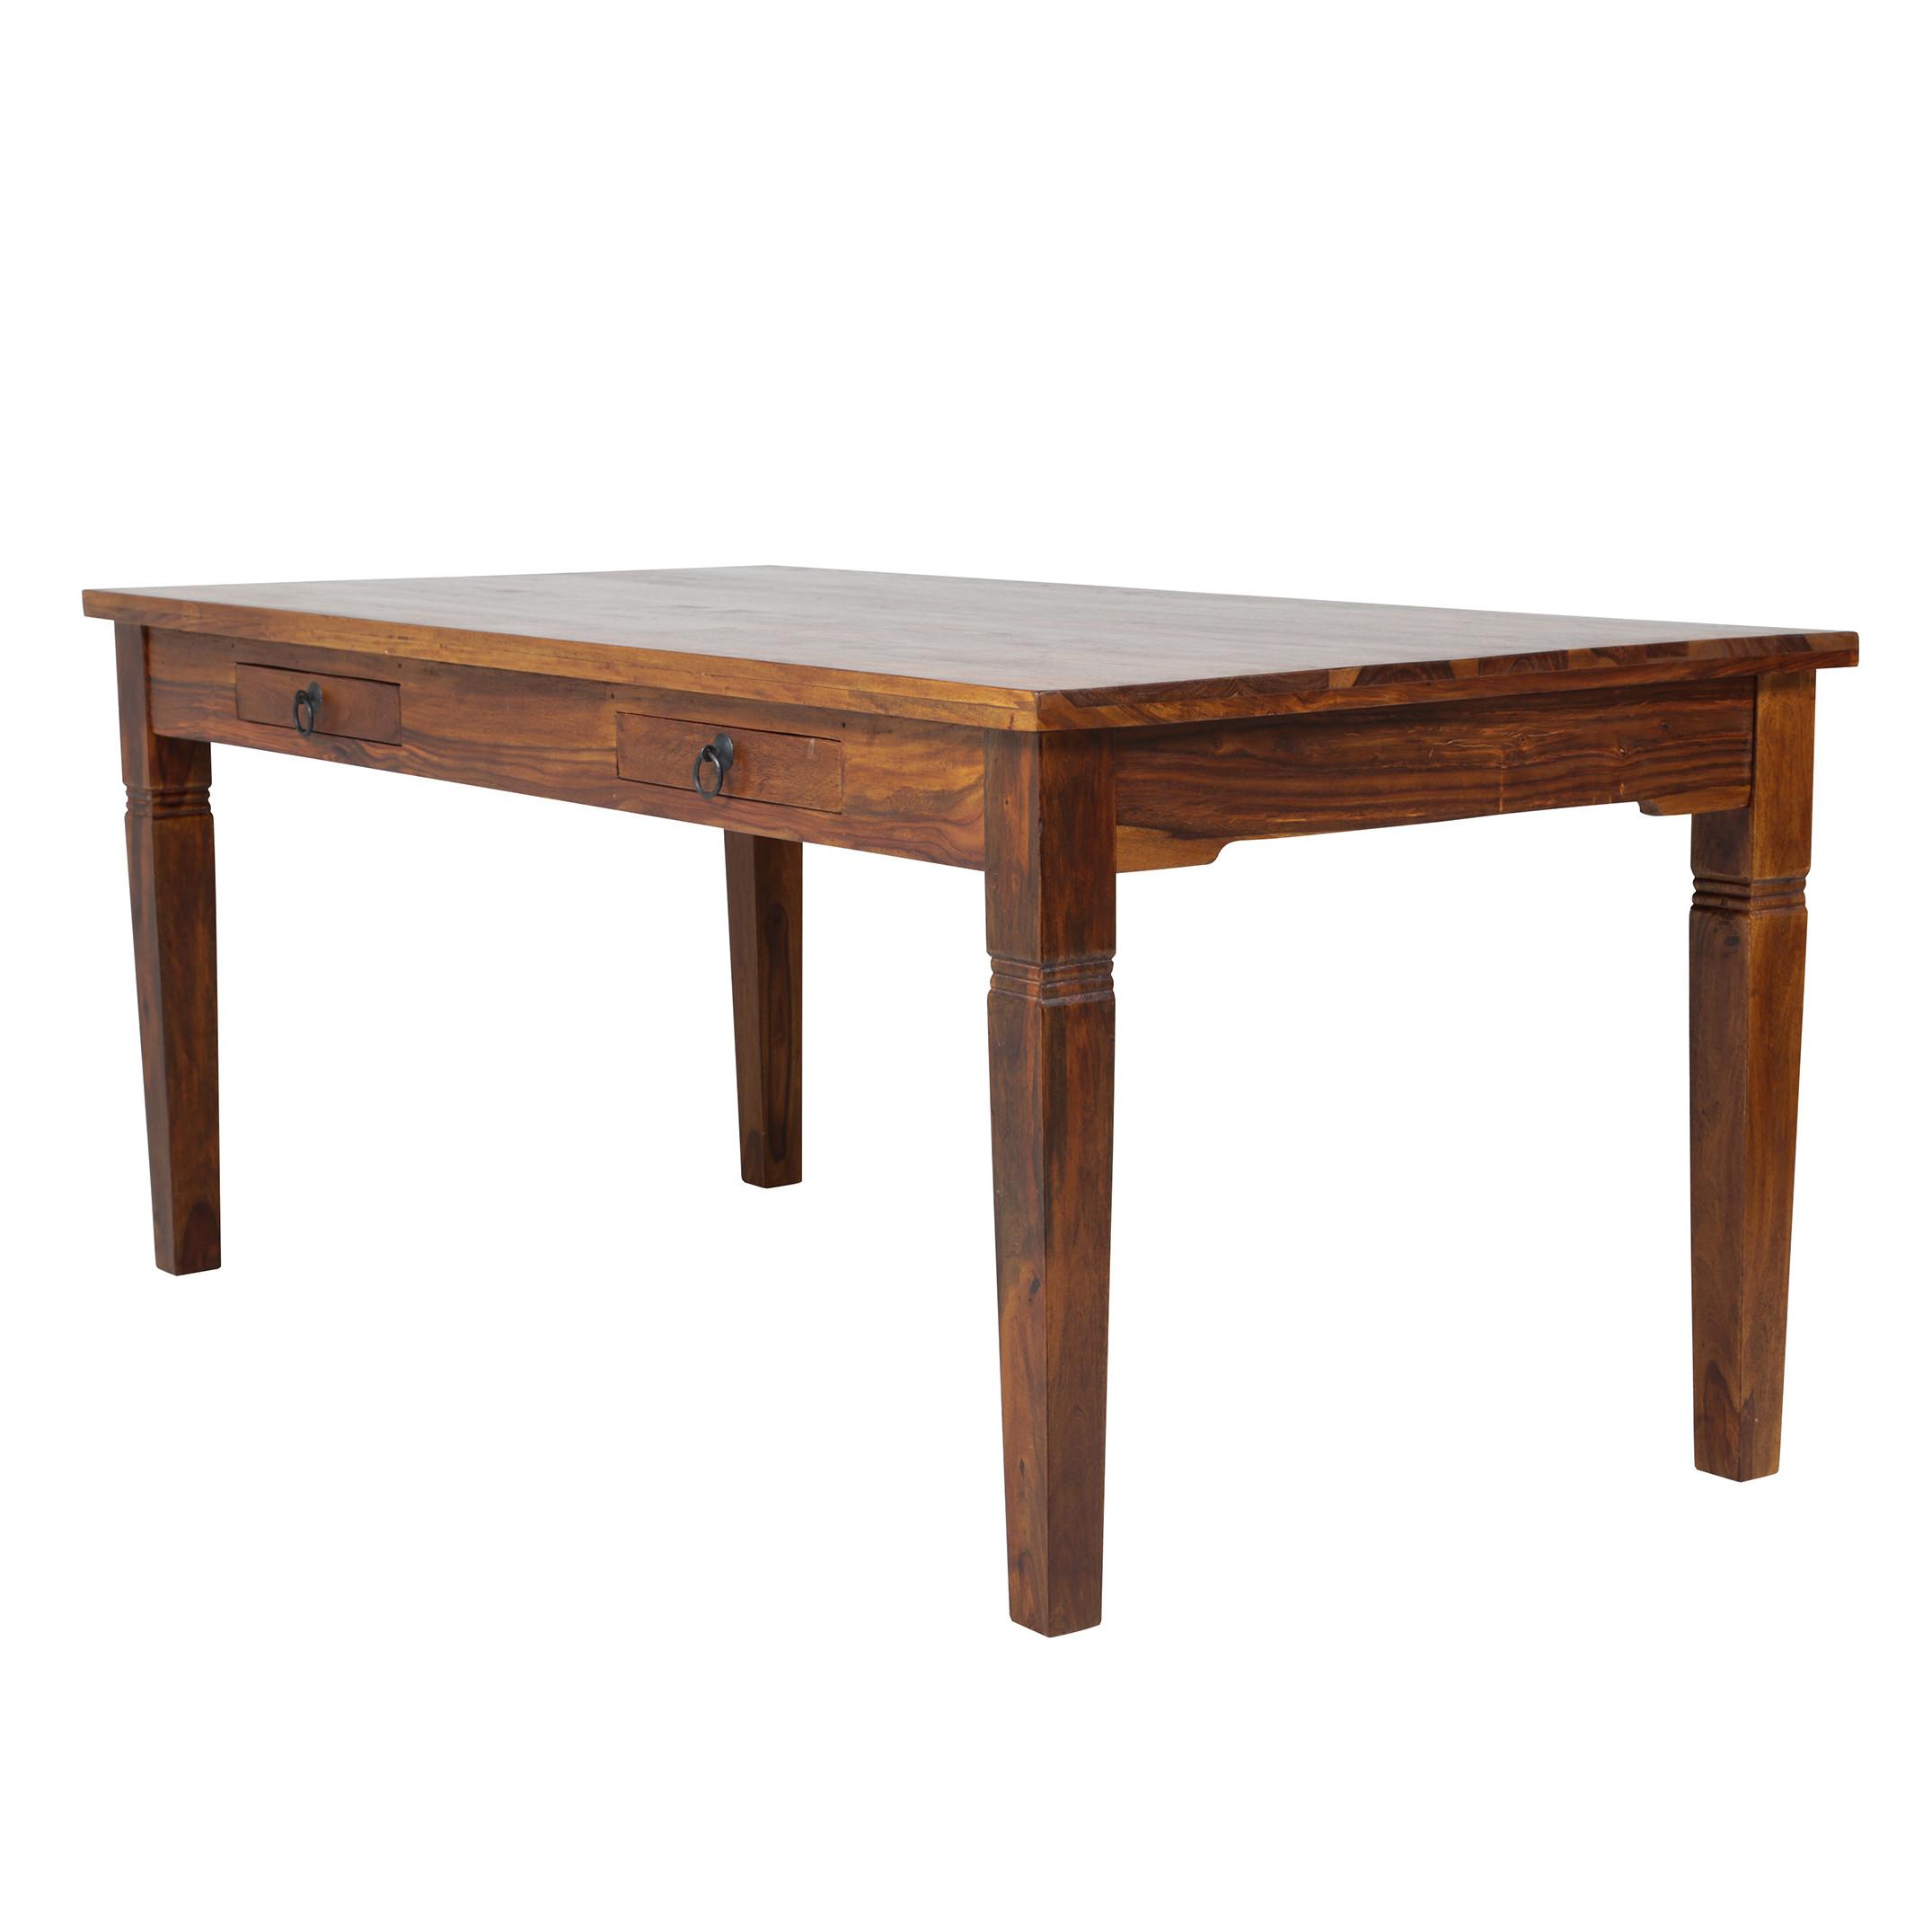 Madrid pöytä 175x90 cm ruskea